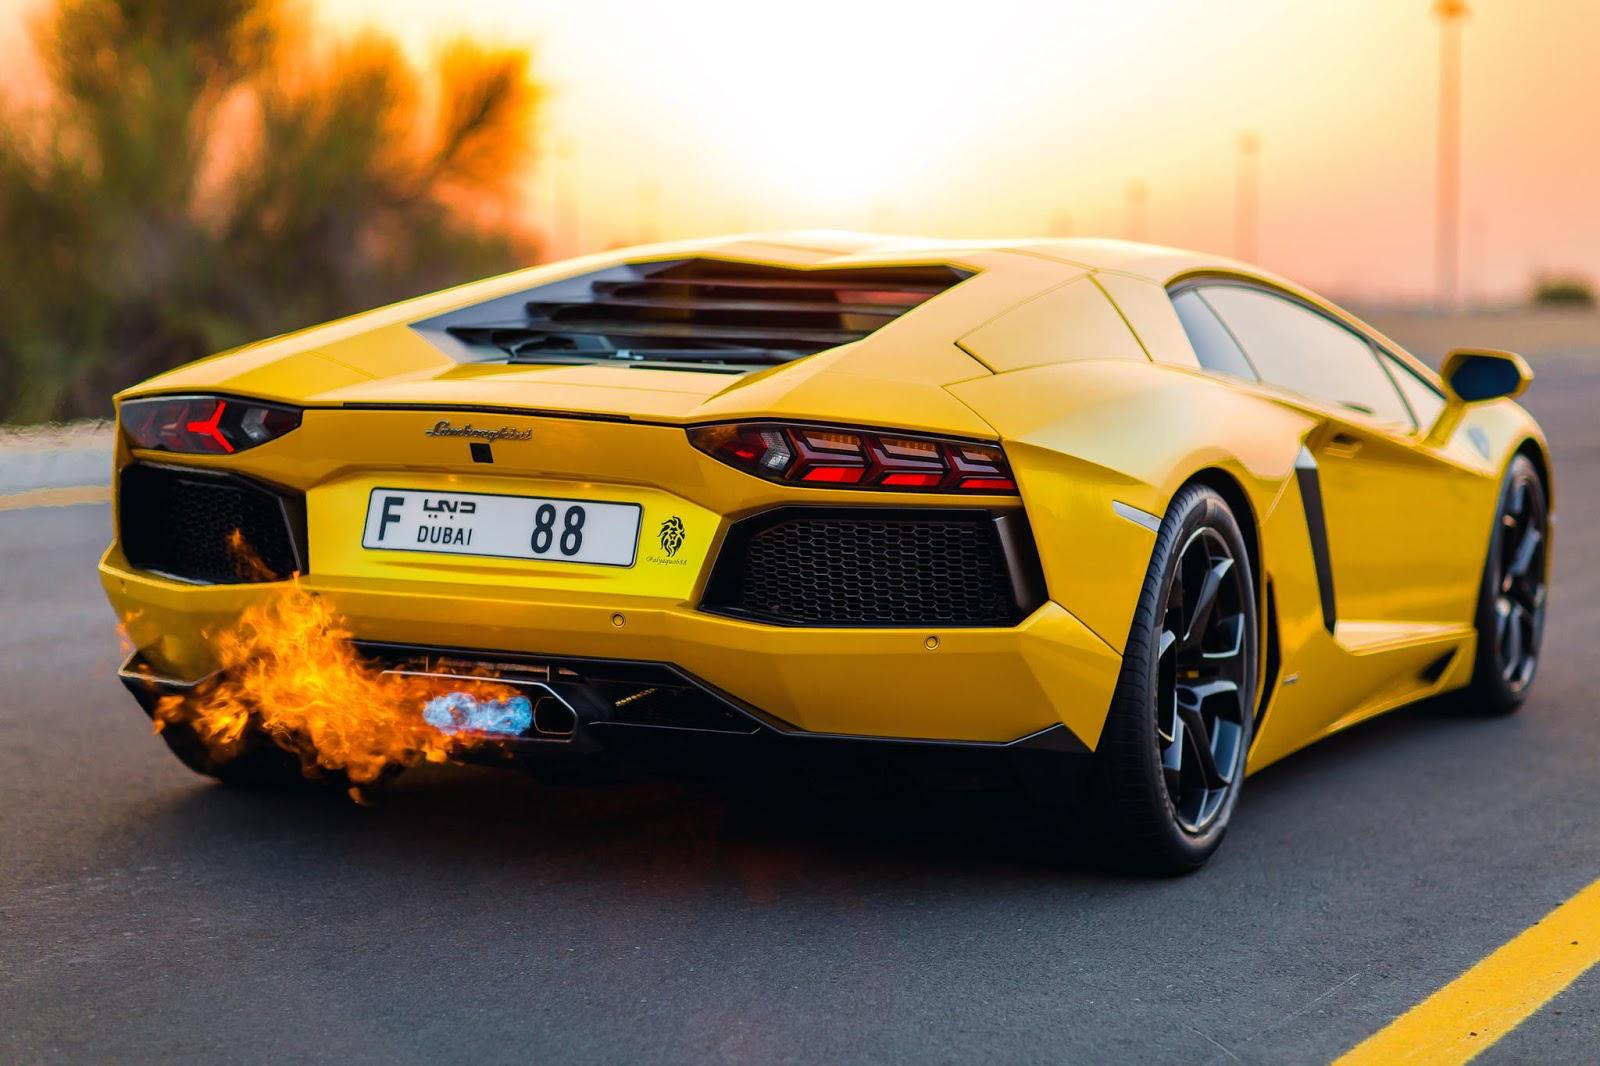 Flaming2BLamborghini Όταν λέμε λιώστο δεν το εννοούμε κυριολεκτικά Fun, Lamborghini, Lamborghini Aventador, videos